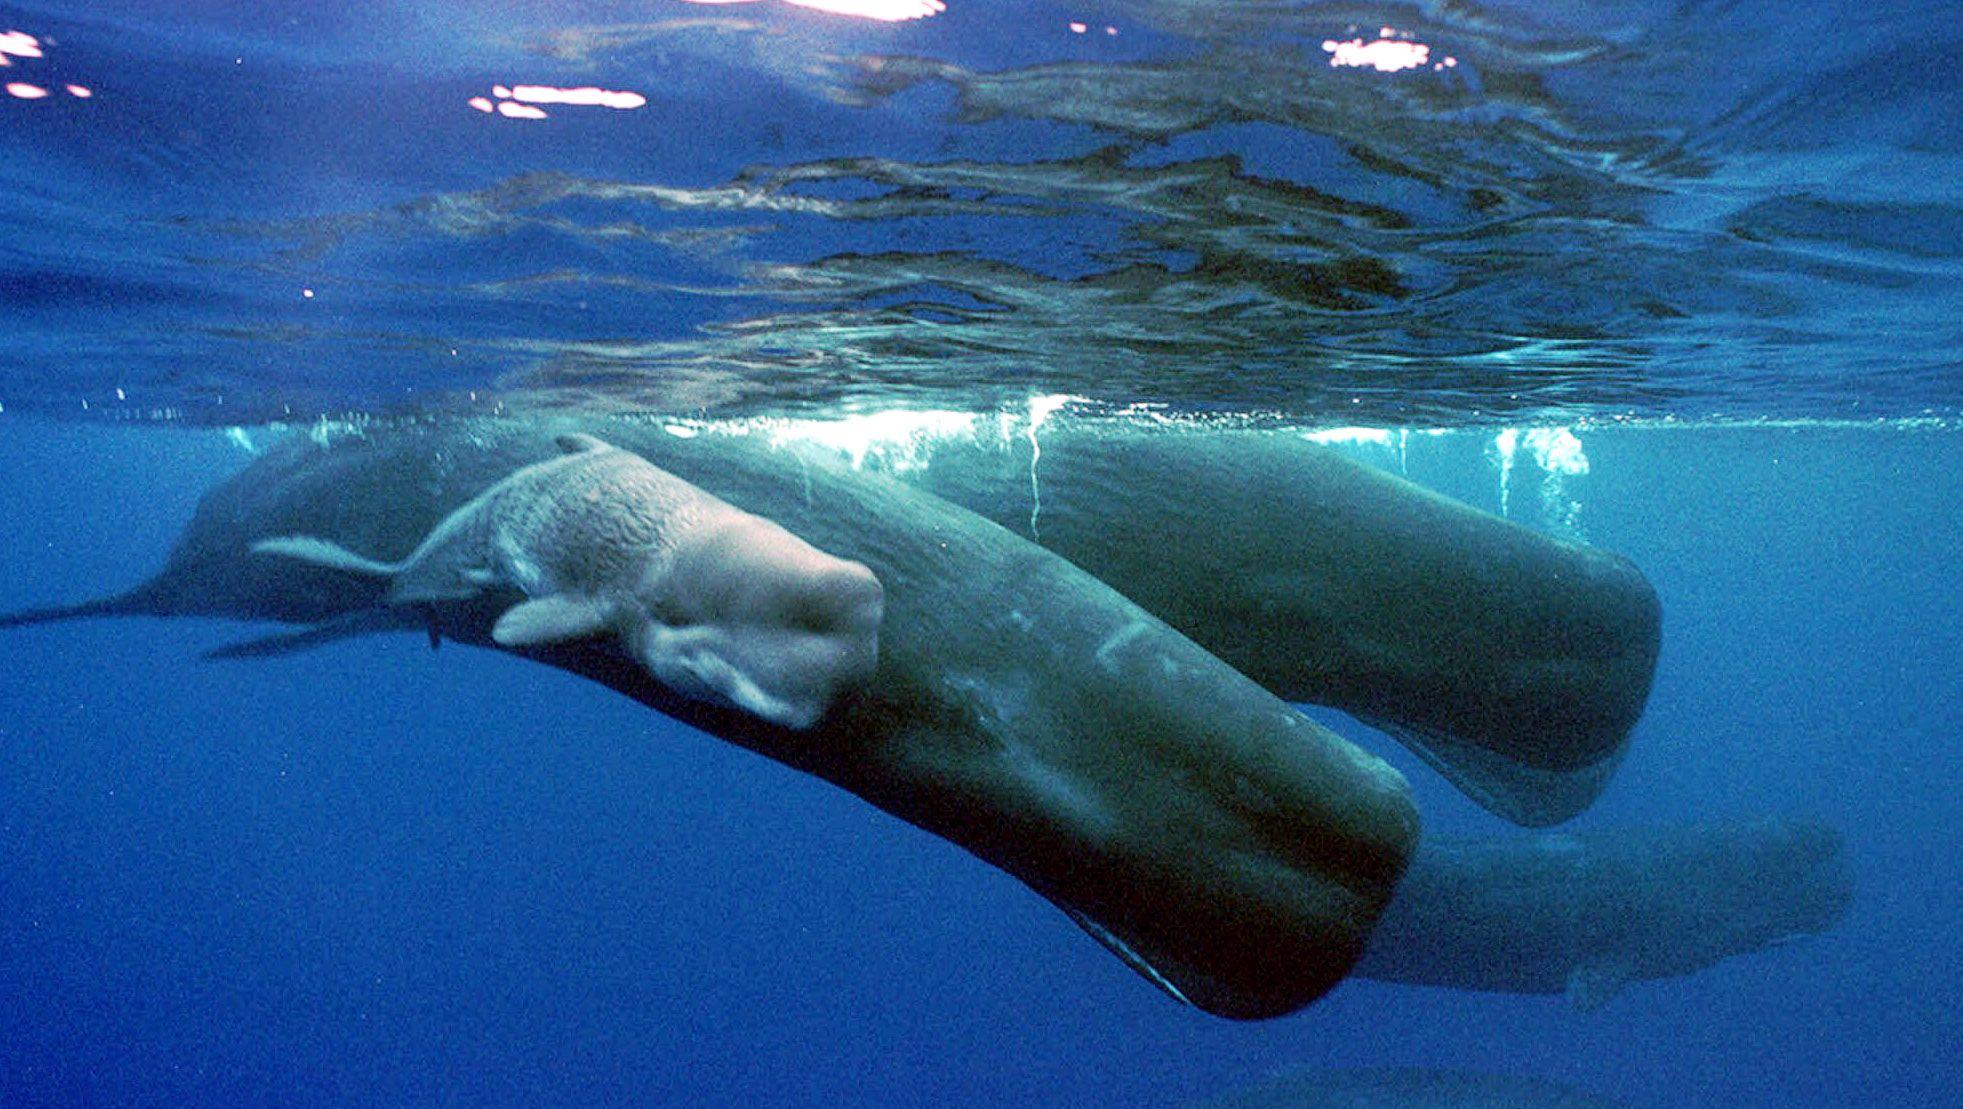 Sperm whale and calf - photo#1